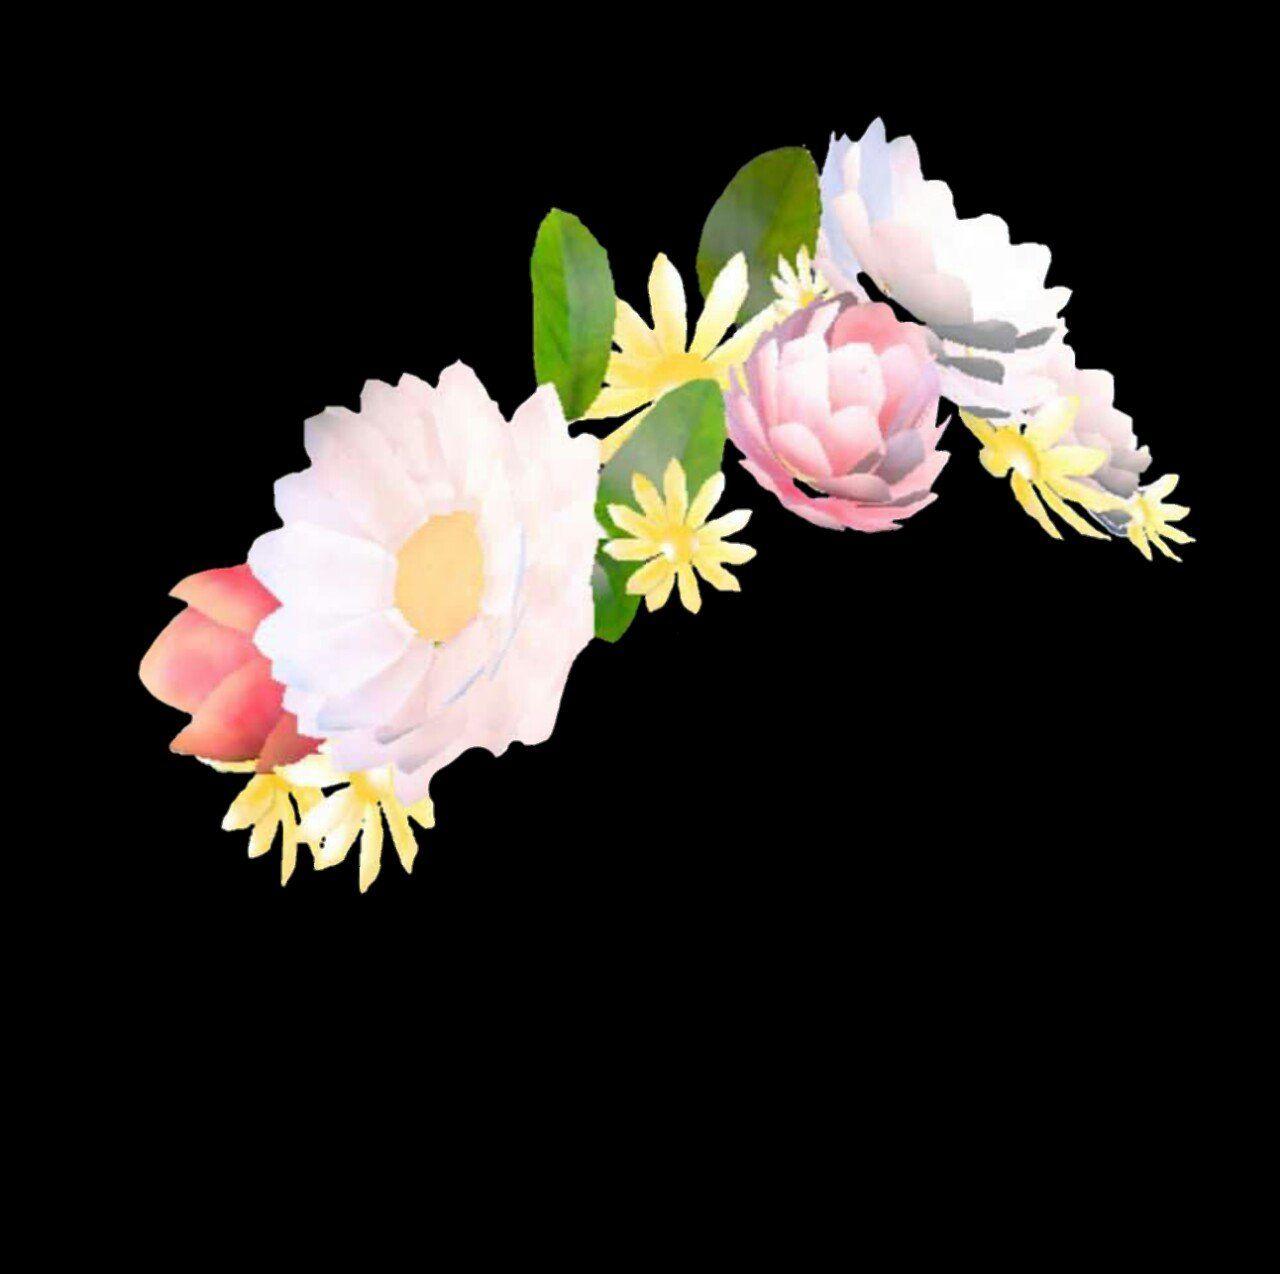 Flower crown transparent background crazywidowfo flower crown transparent background izmirmasajfo